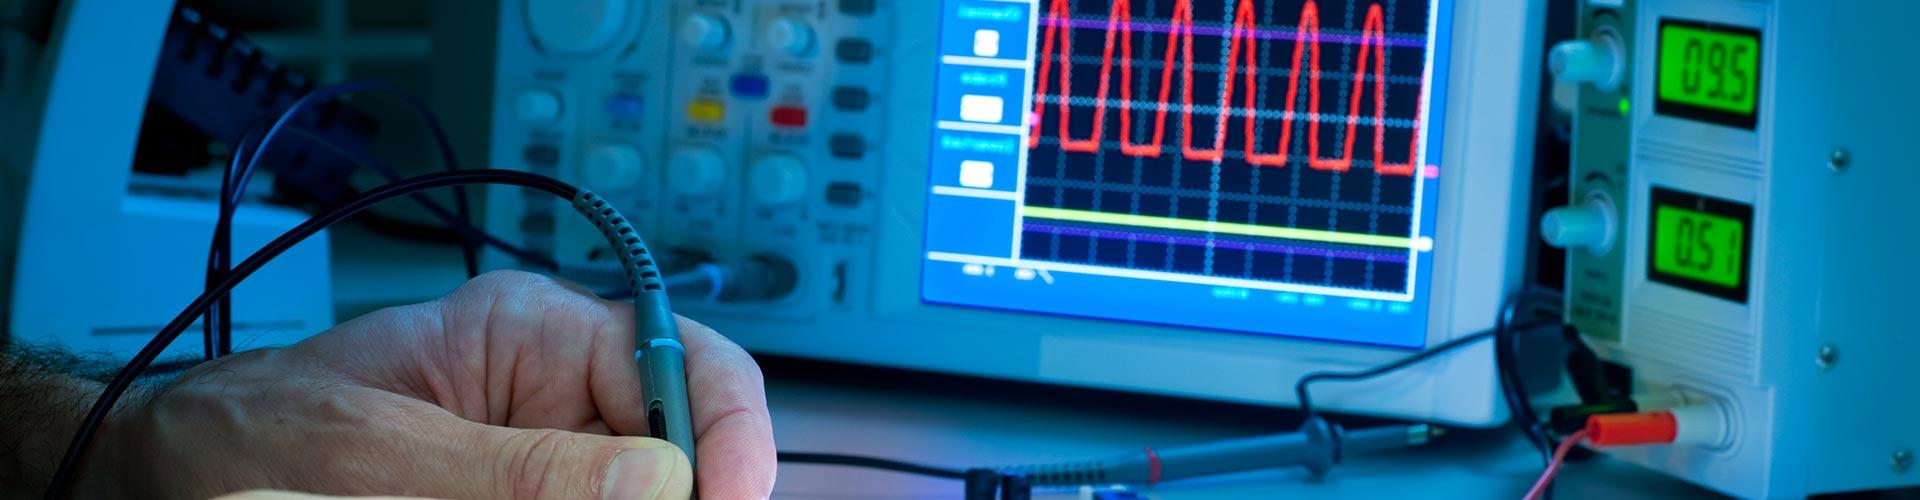 Testing and Measurement Equipment - MCI Transformer Corporation